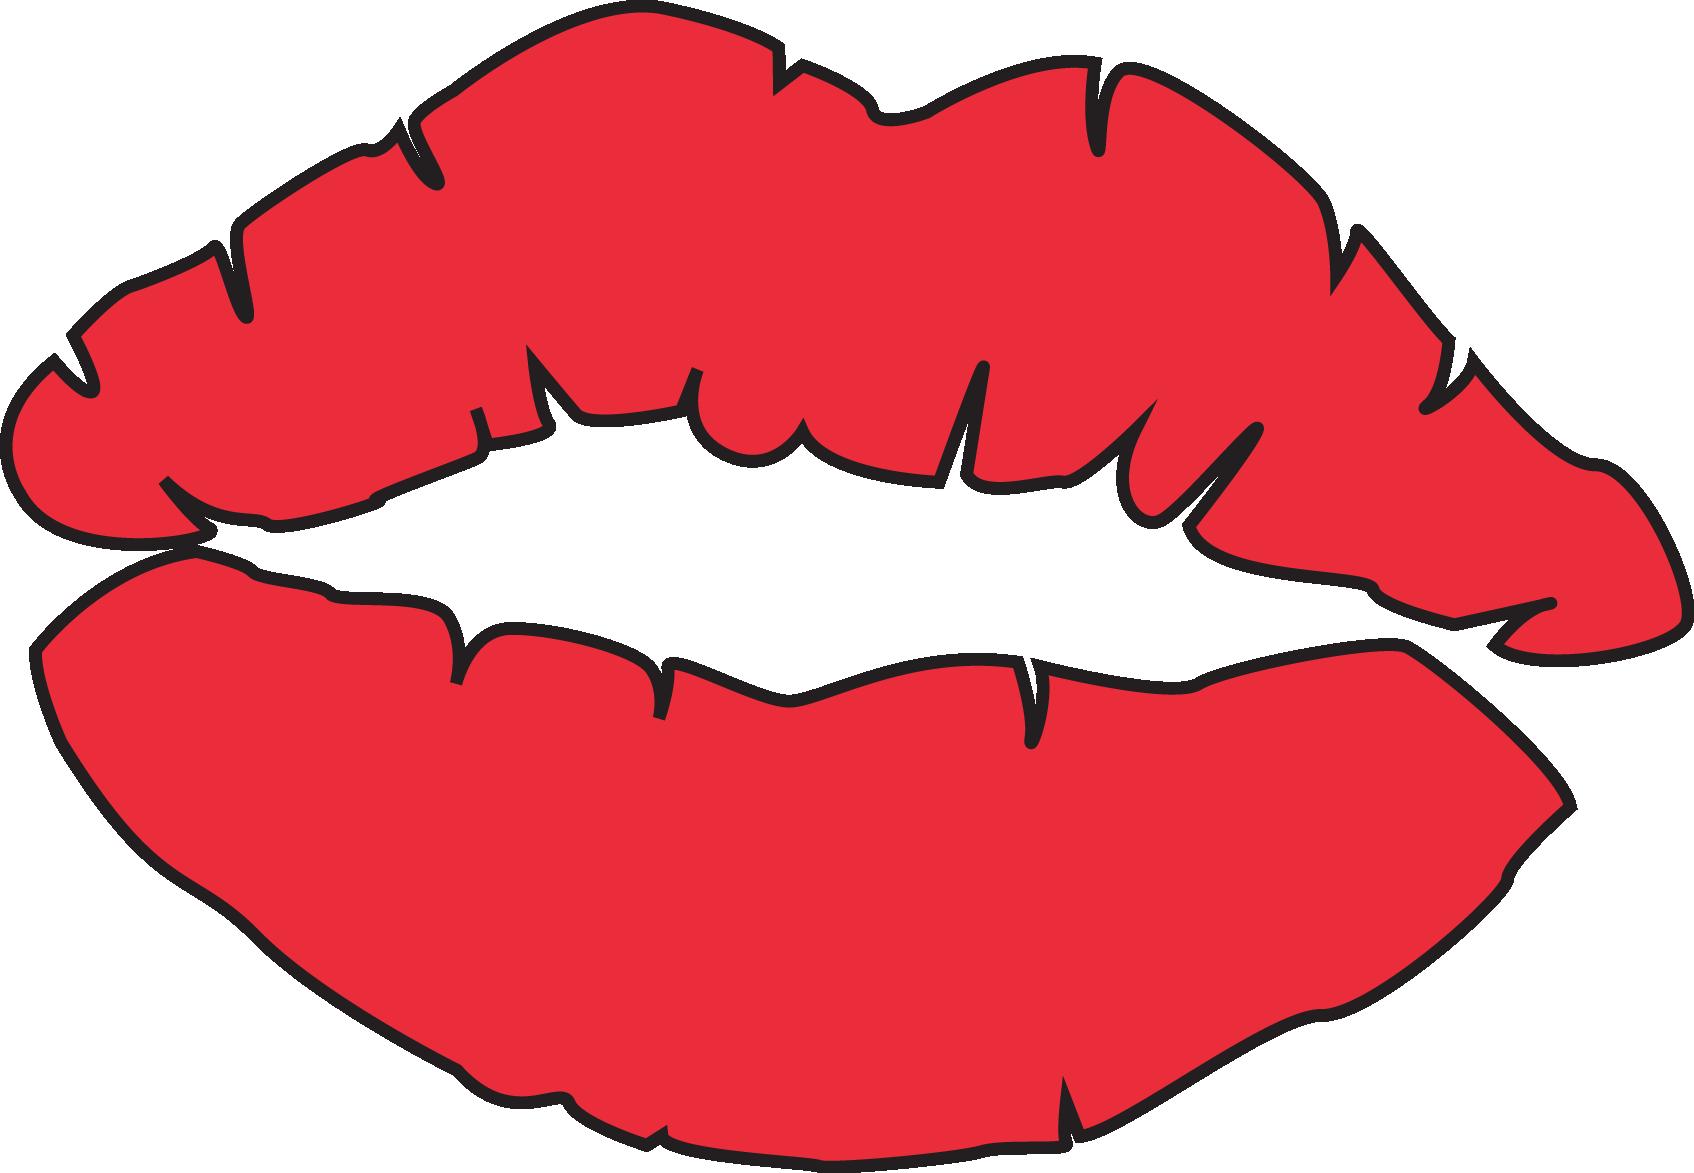 Download Lipstick Clipart Cartoon Source - Kissing Lips ...